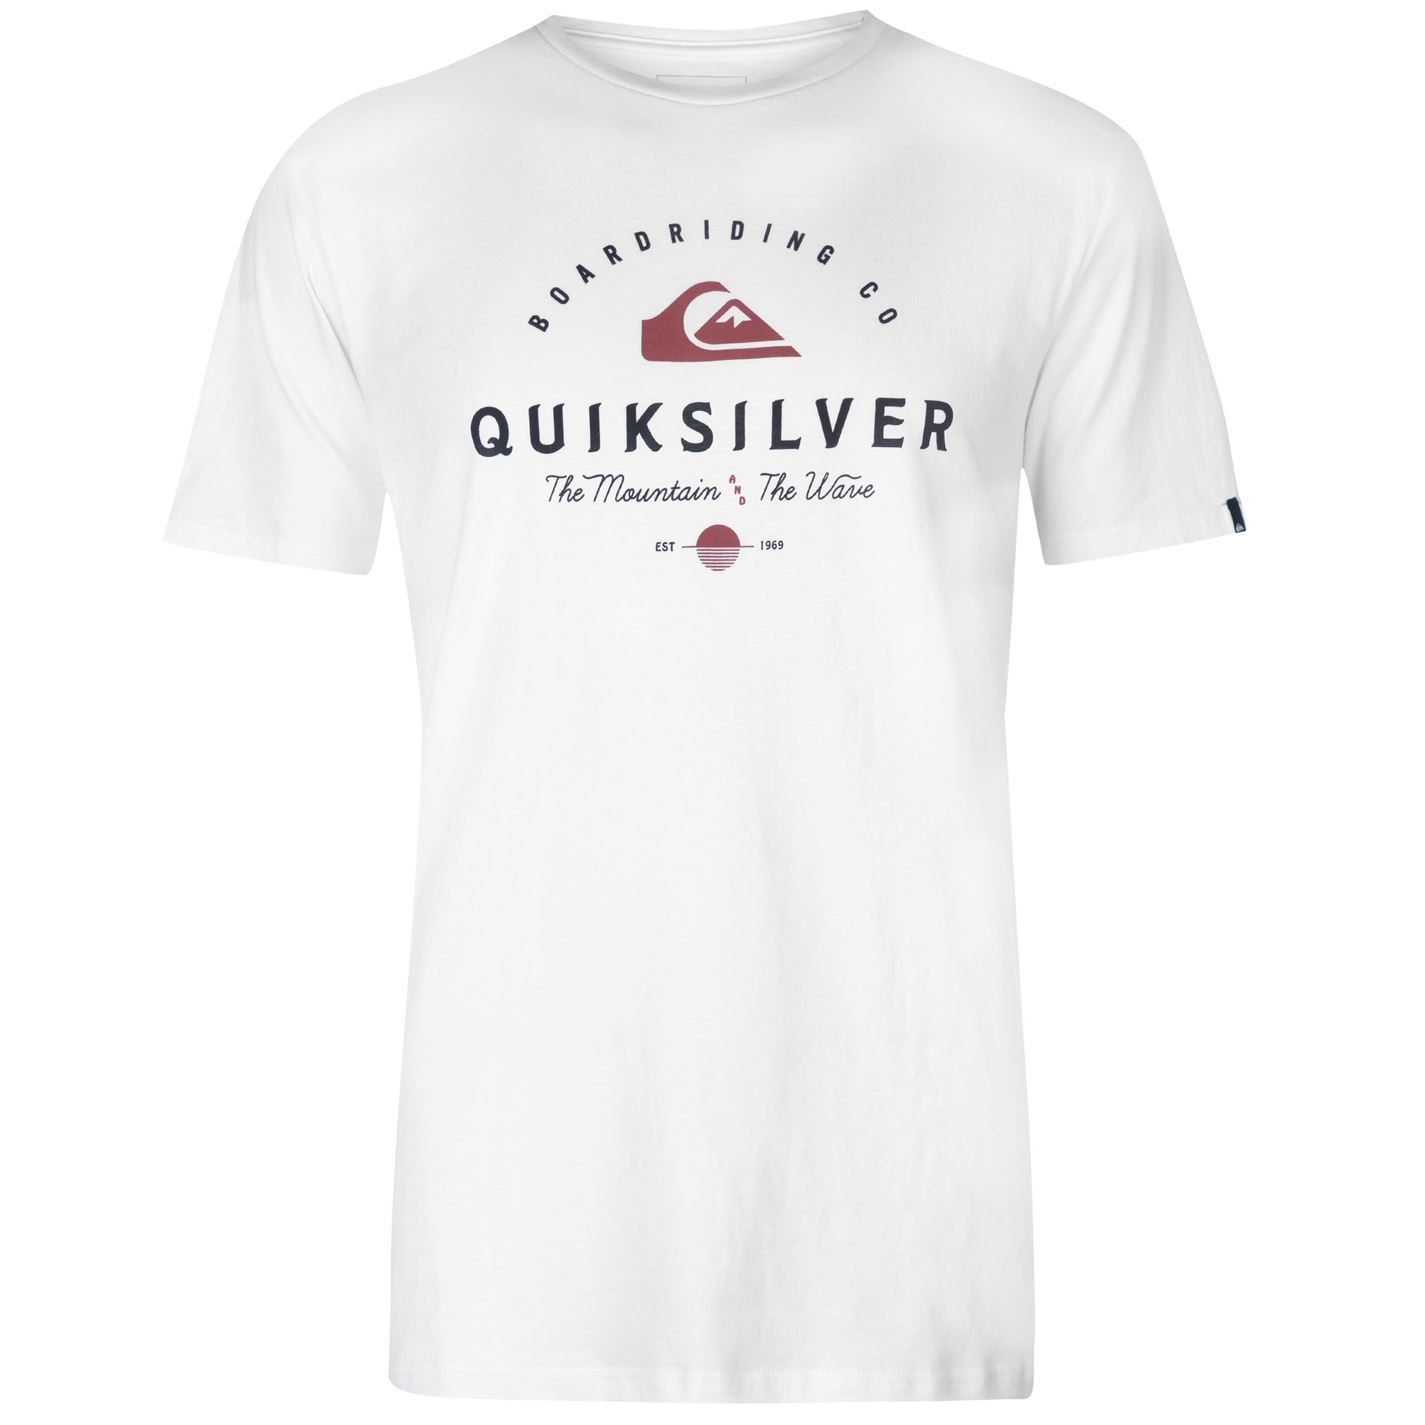 Quiksilver-Working-Man-T-Shirt-Mens-Tee-Shirt-Top thumbnail 10